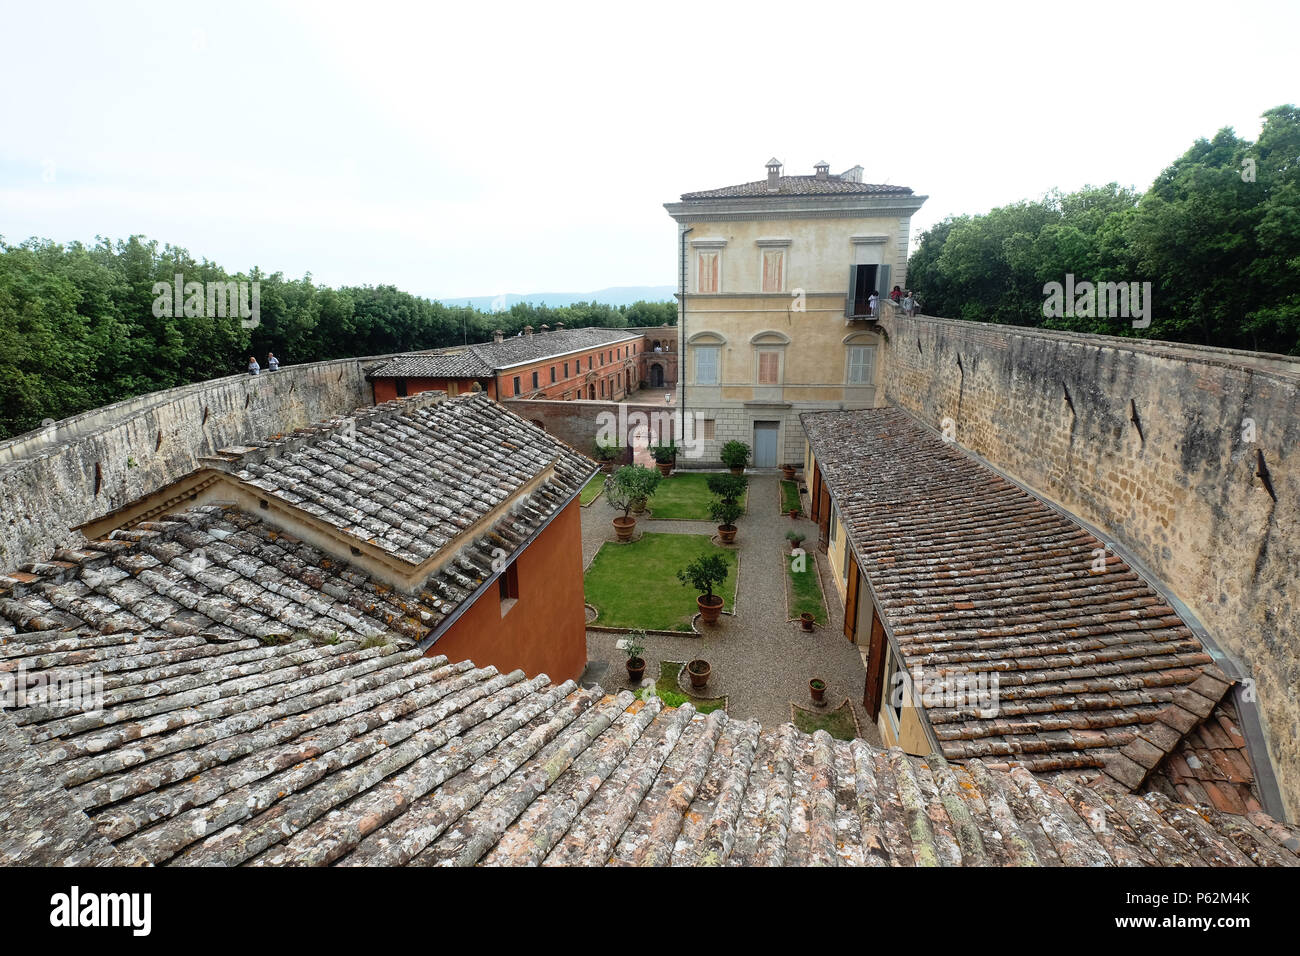 The castle of Belcaro,Siena,Italy - Stock Image